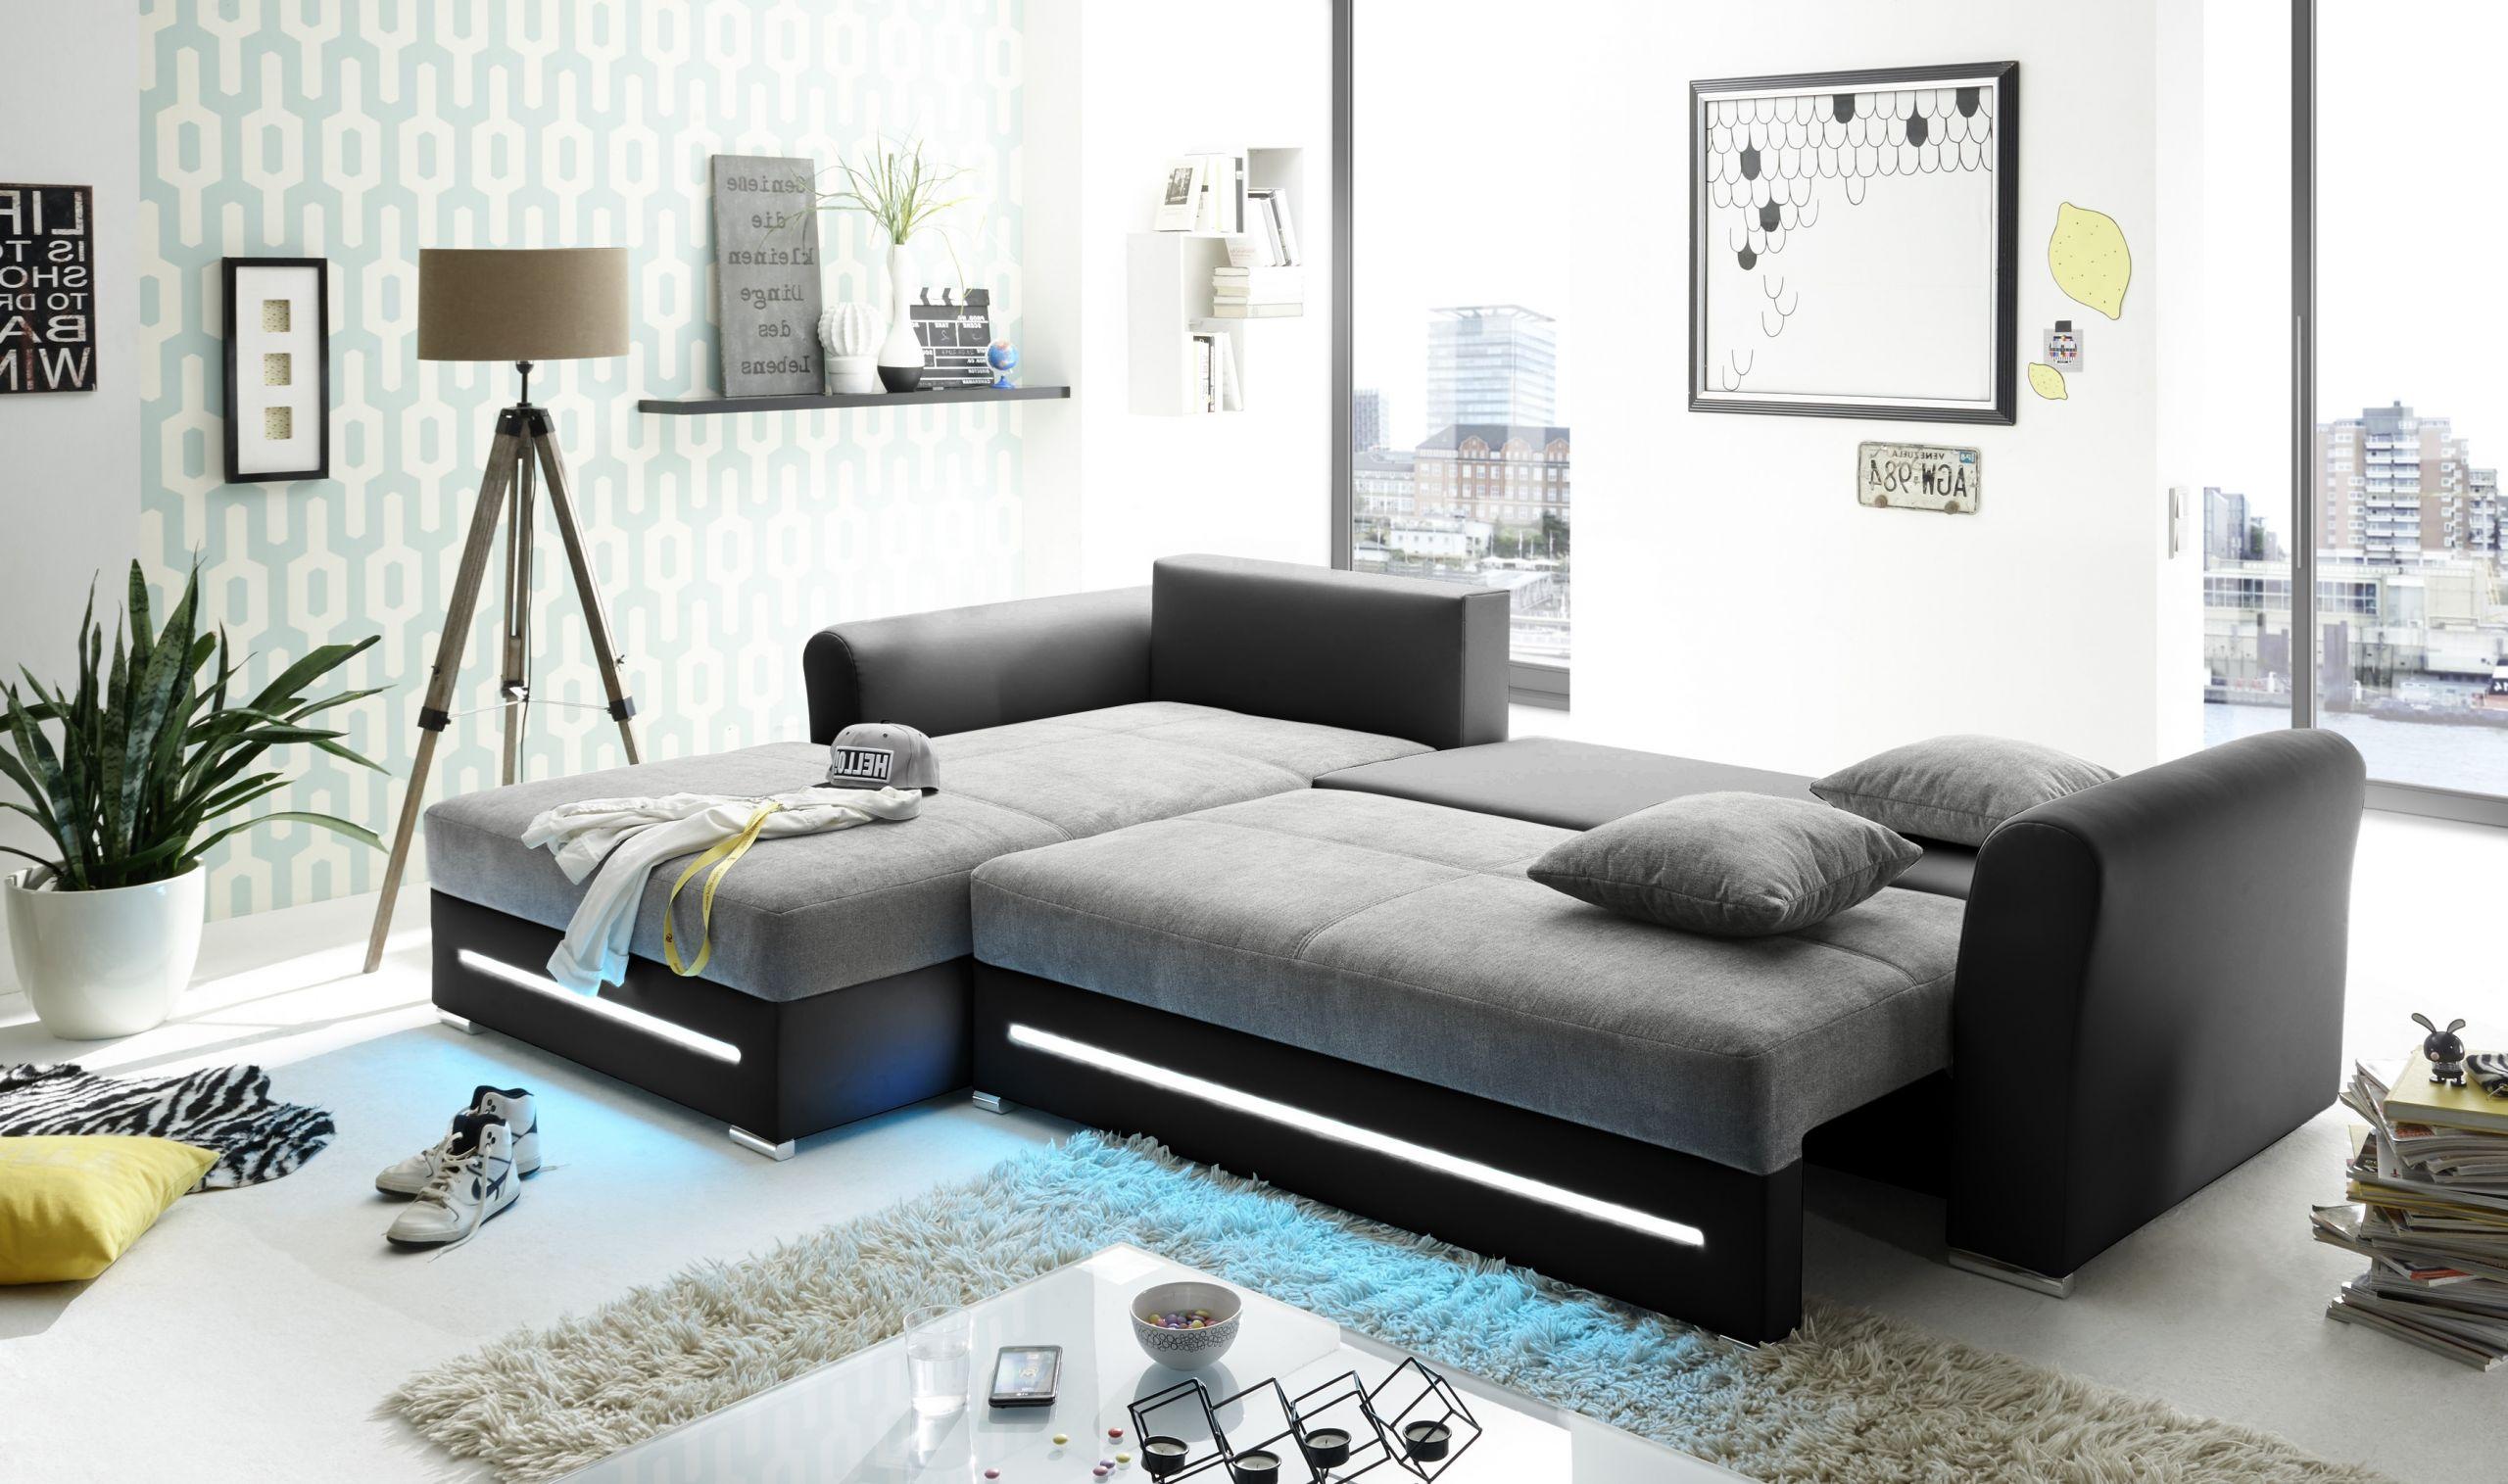 ecksofa kent couch schlafcouch bettsofa schlafsofa sofabett funktionssofa ausziehbar beleuchtung schwarz schlamm grau l form links